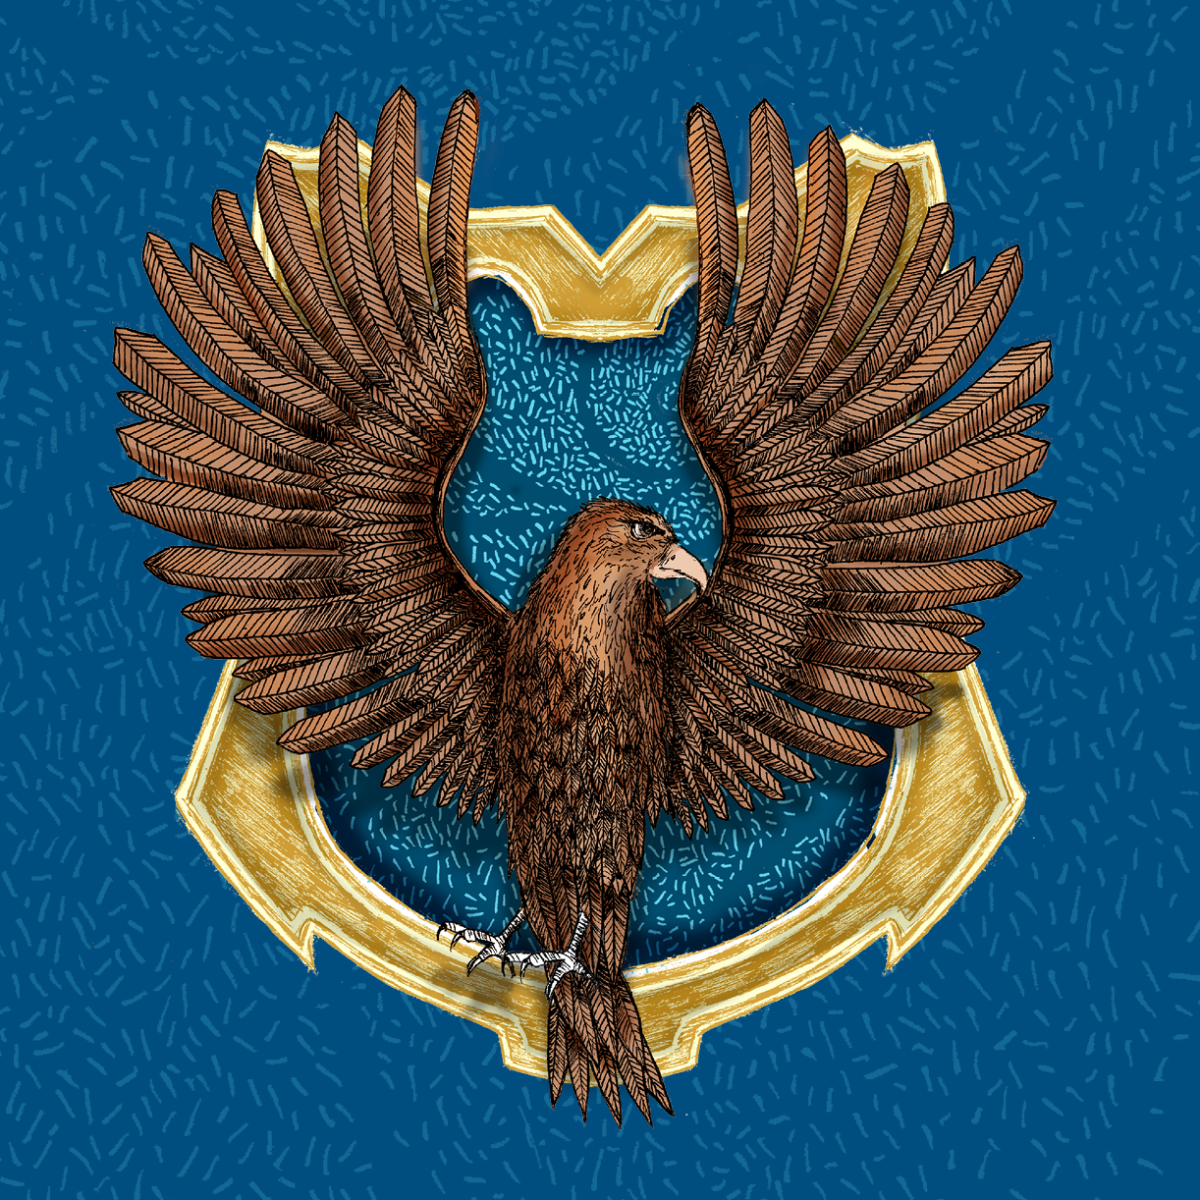 Hogwarts Houses Ravenclaw